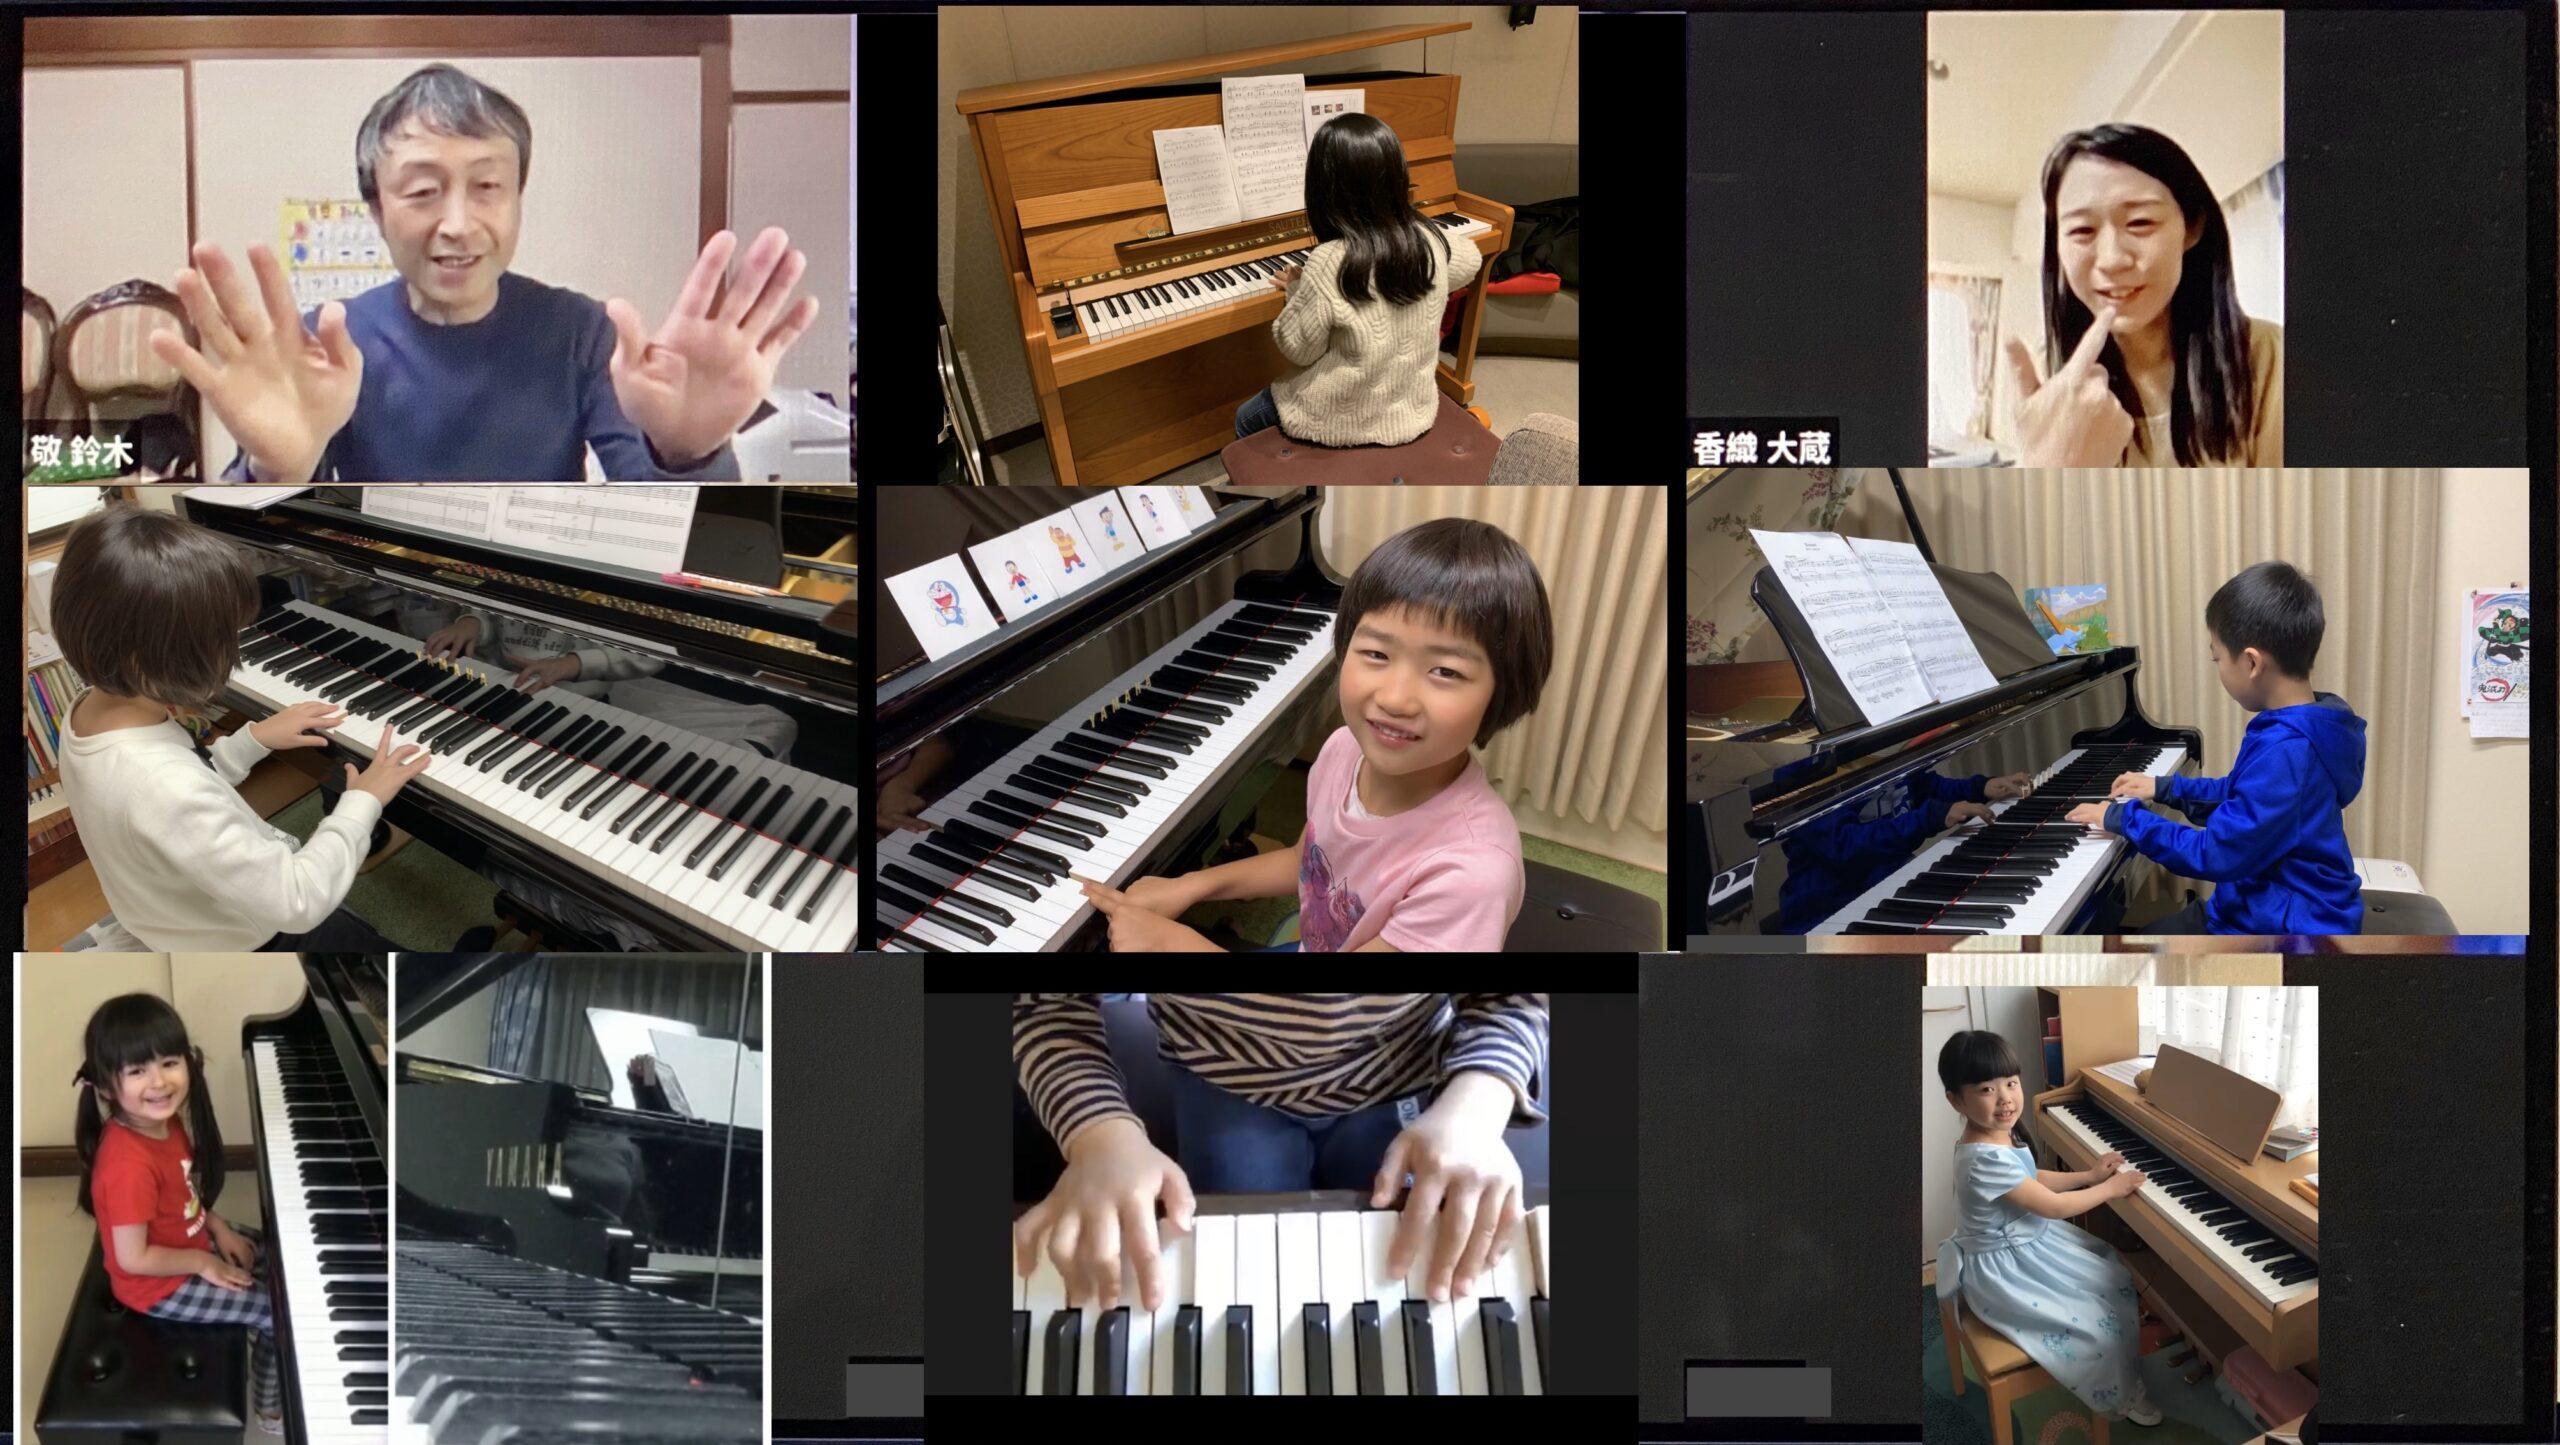 <No.155>「競争」を「共奏」に〜オンライン時代の音楽教室